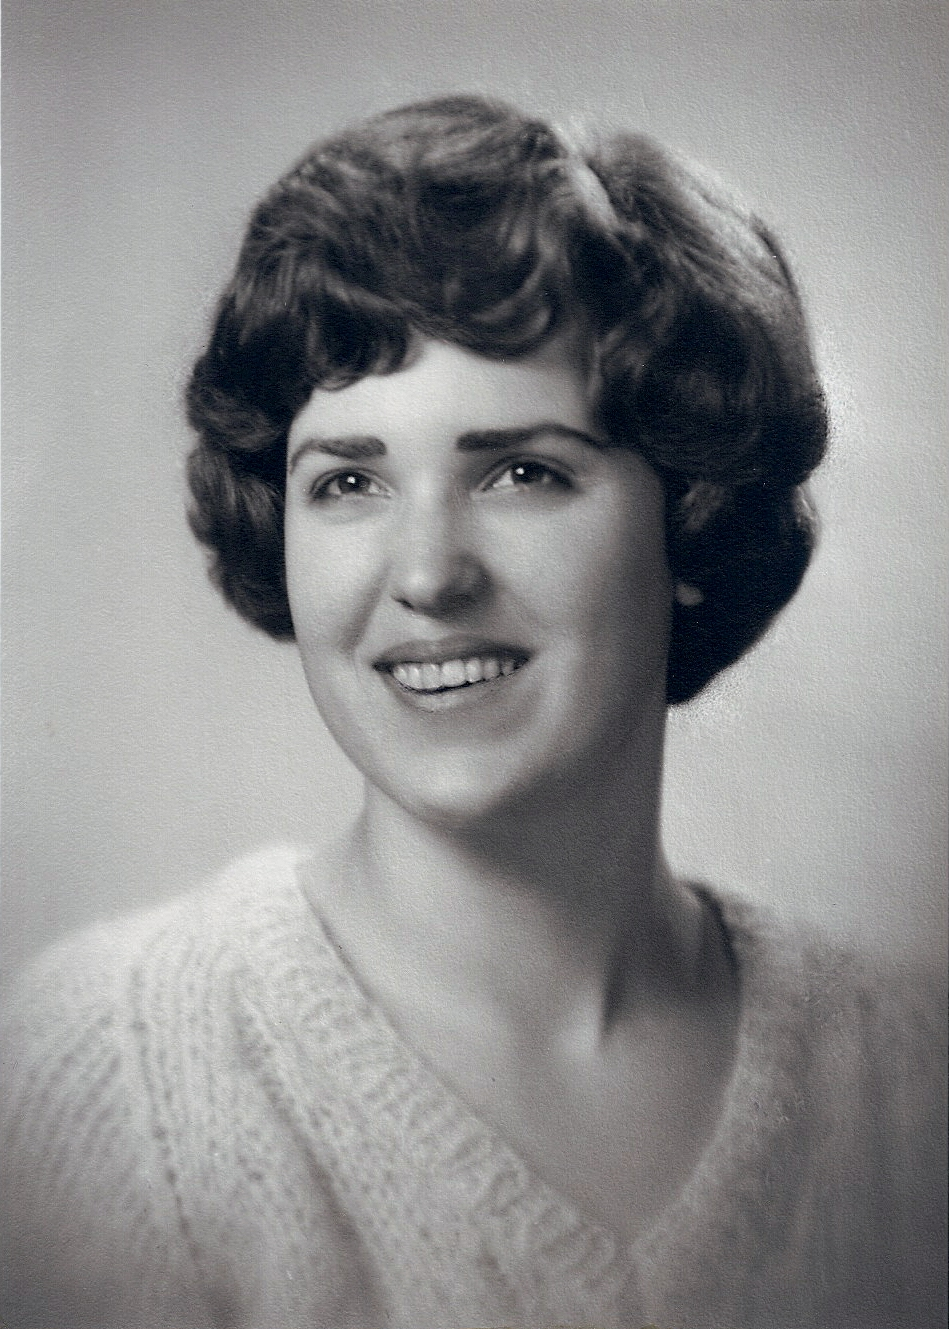 Freshman College portrait